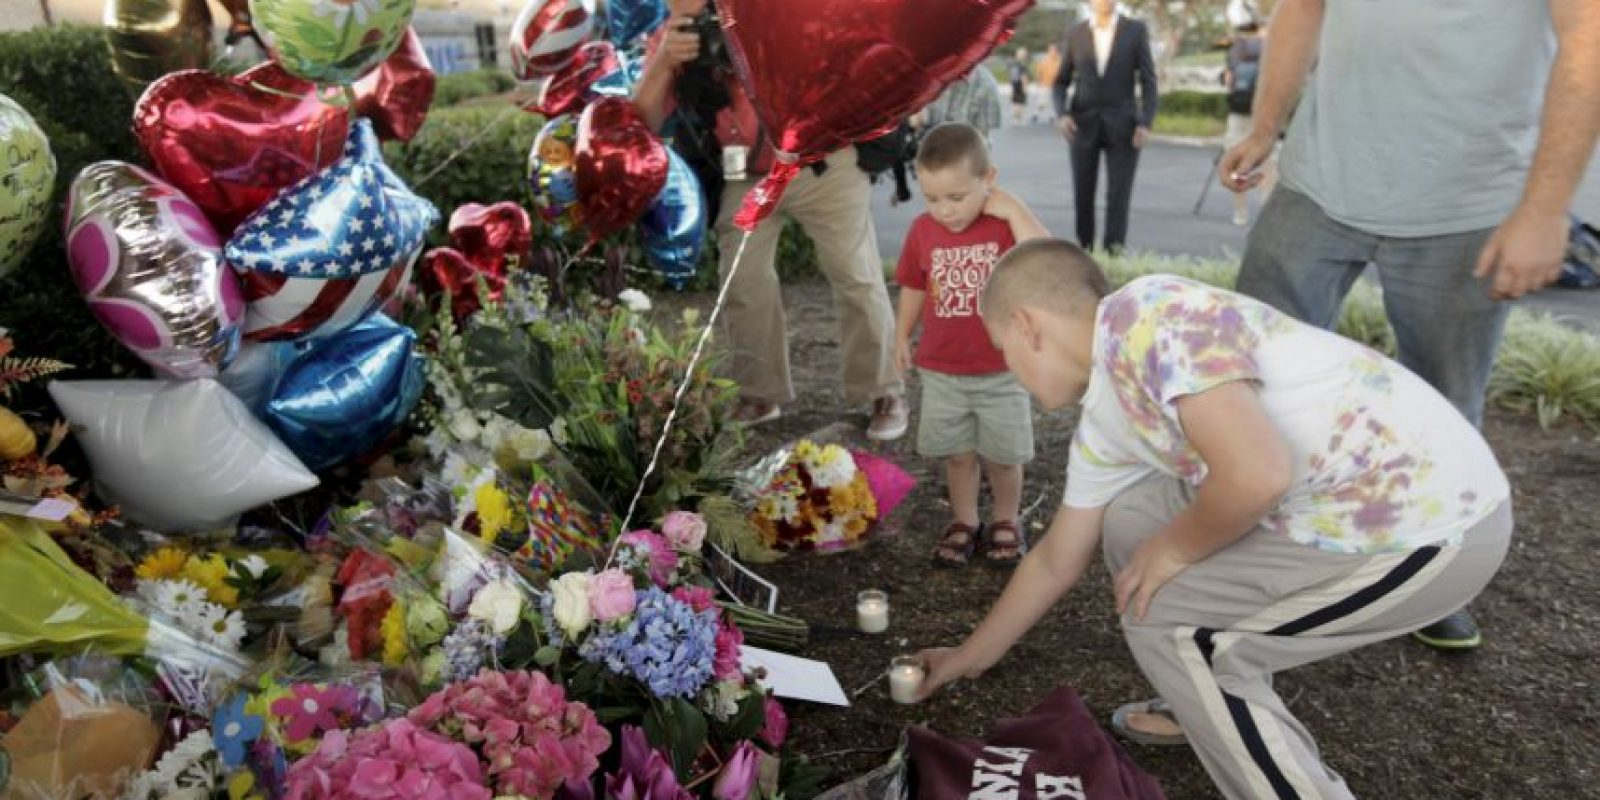 Después de asesinar a sus compañeros se quitó la vida. Foto:Getty Images